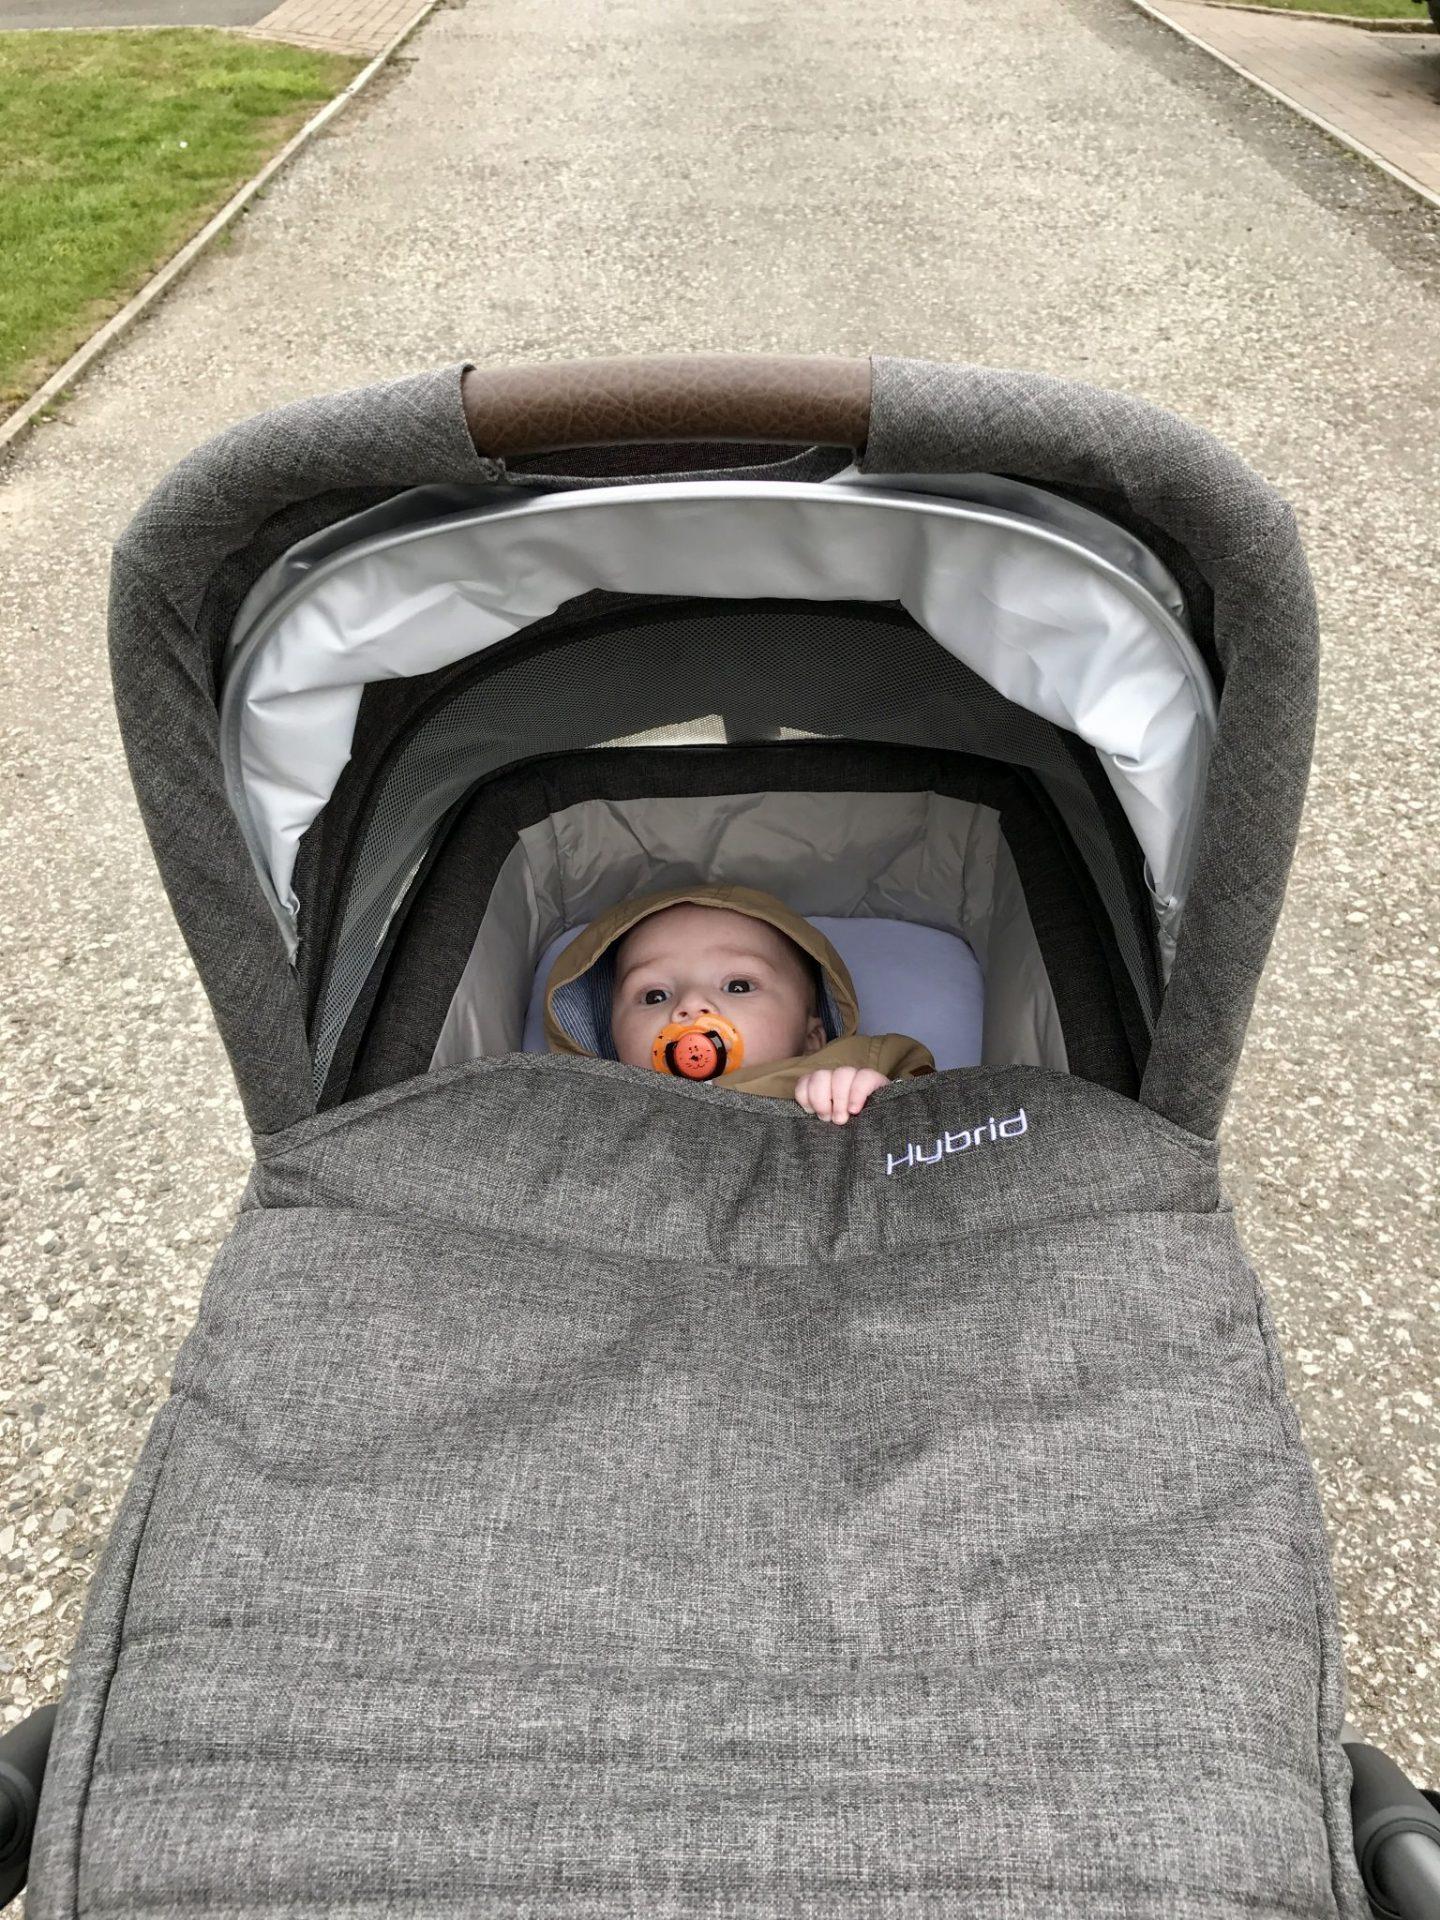 The Hybrid Stroller by BabyStyle - Pretty Big Butterflies